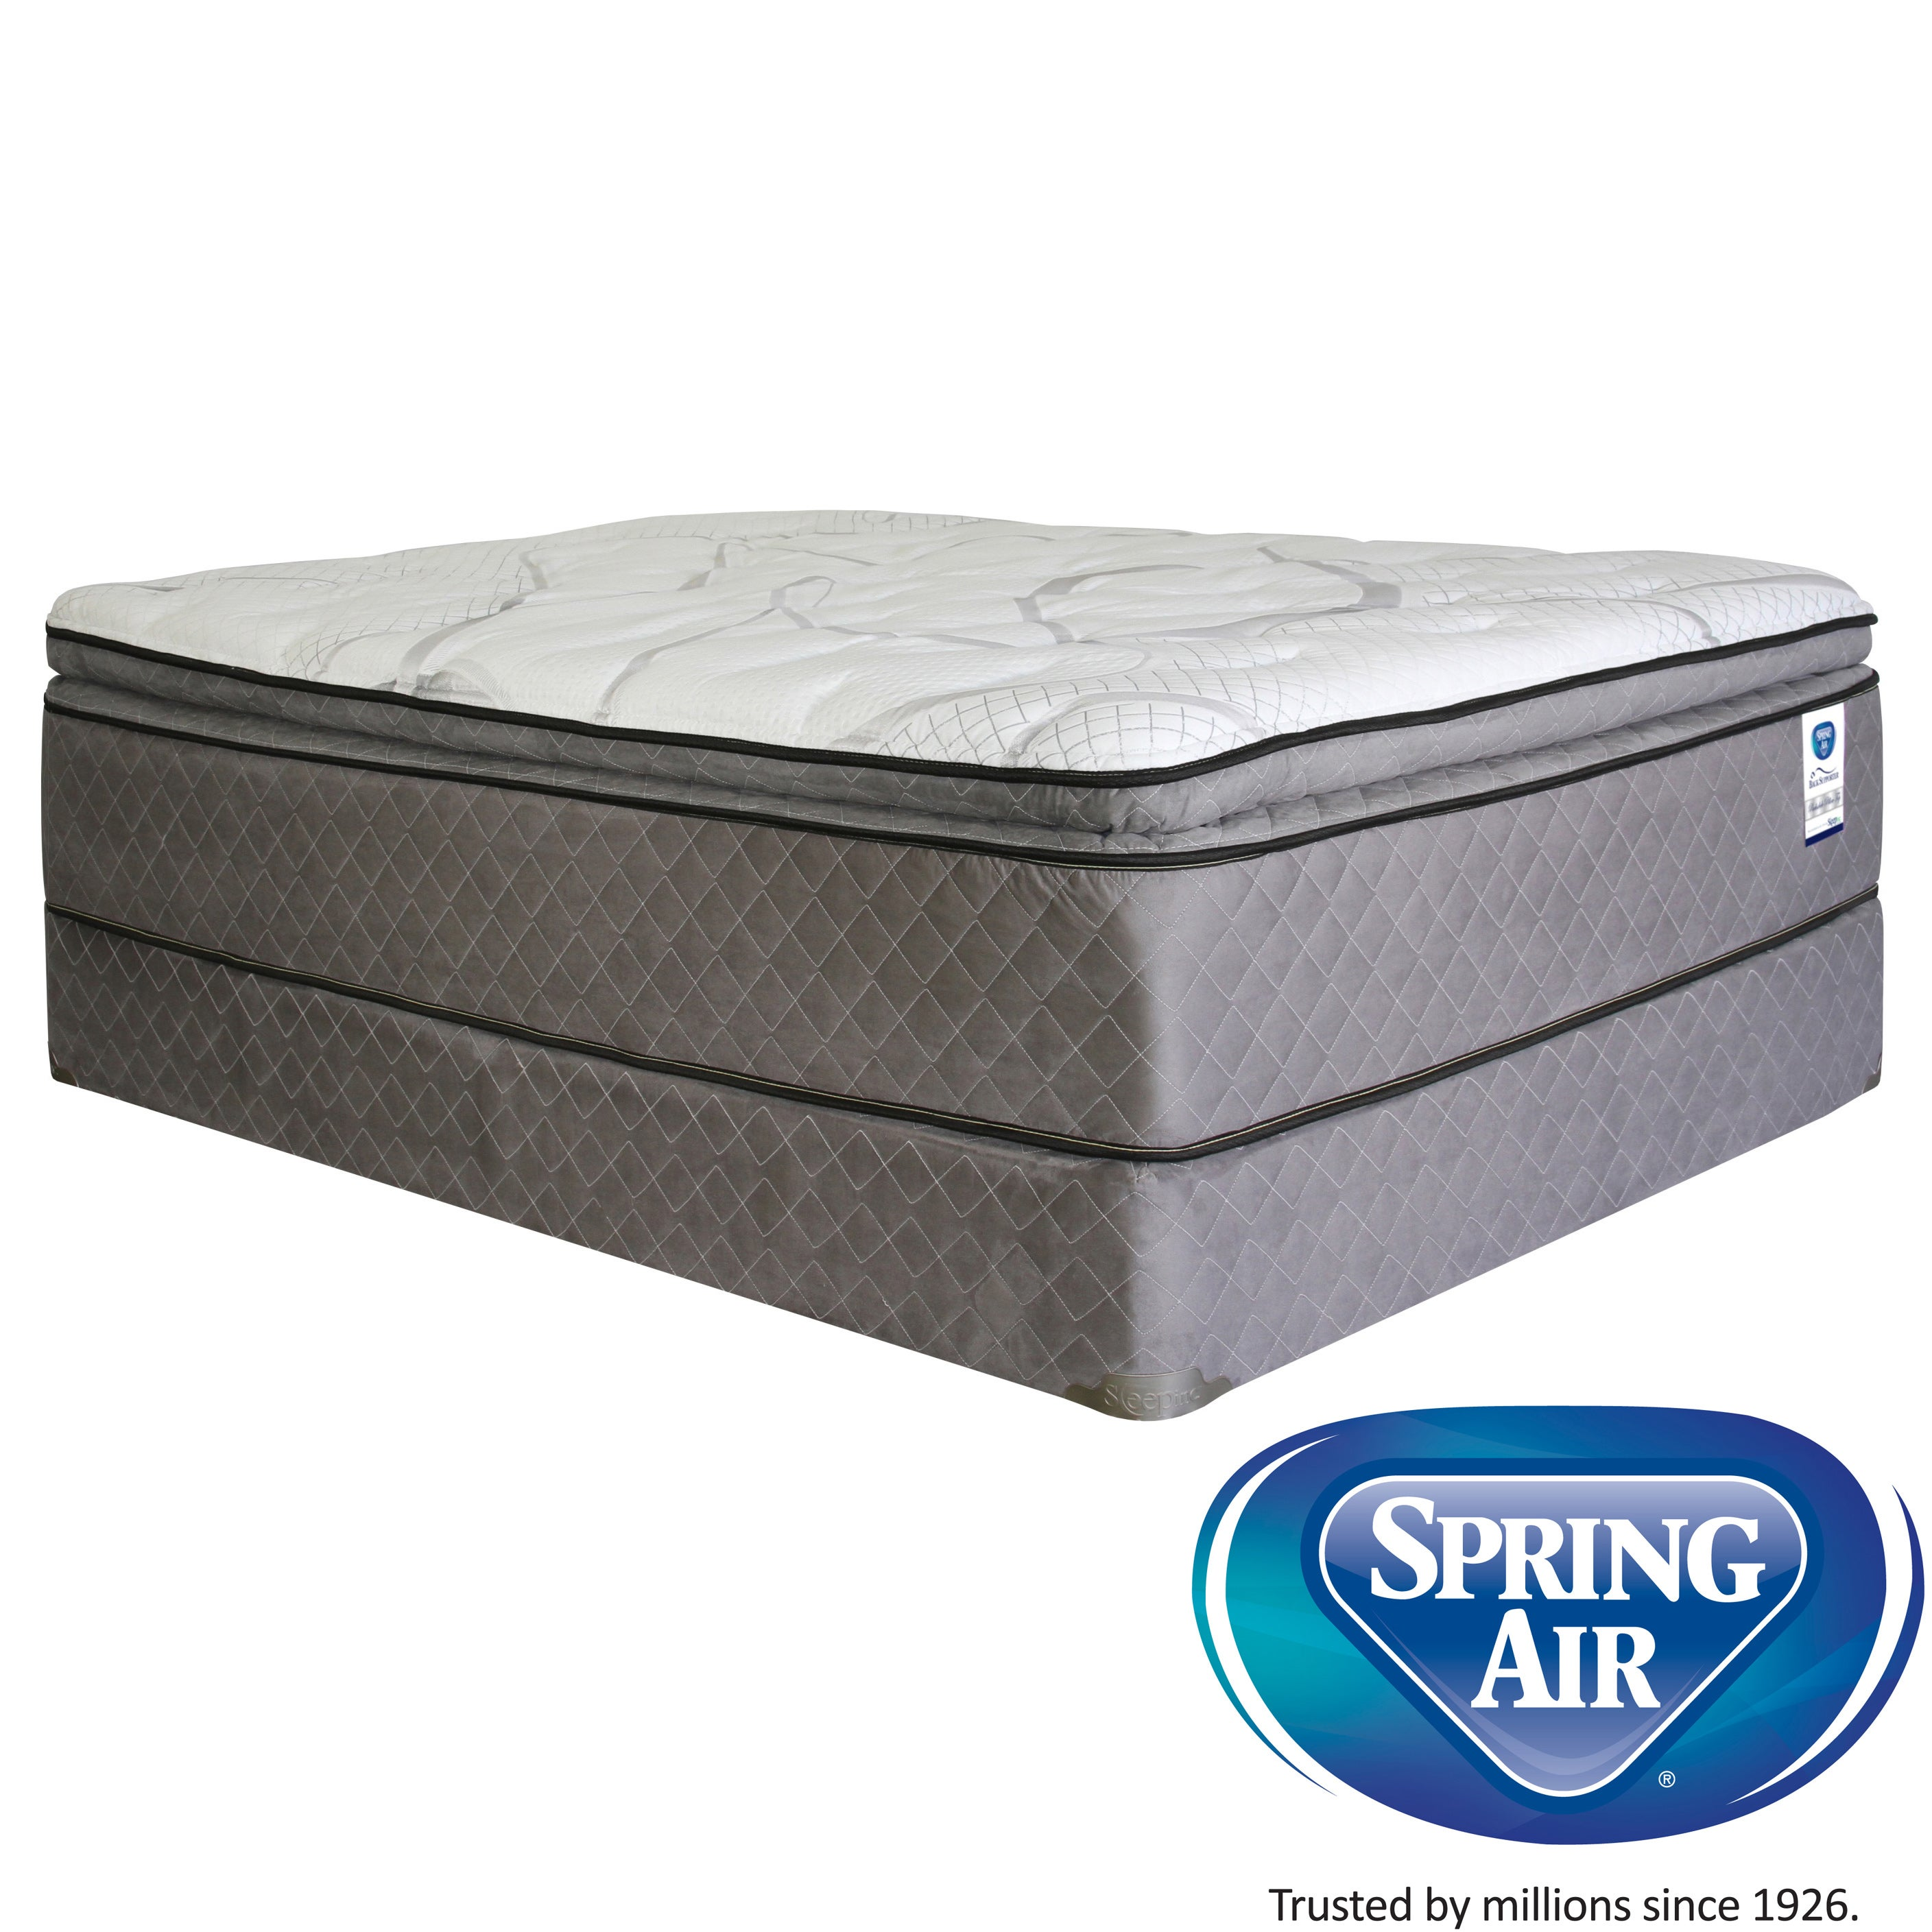 cal king size mattress measurements. Black Bedroom Furniture Sets. Home Design Ideas